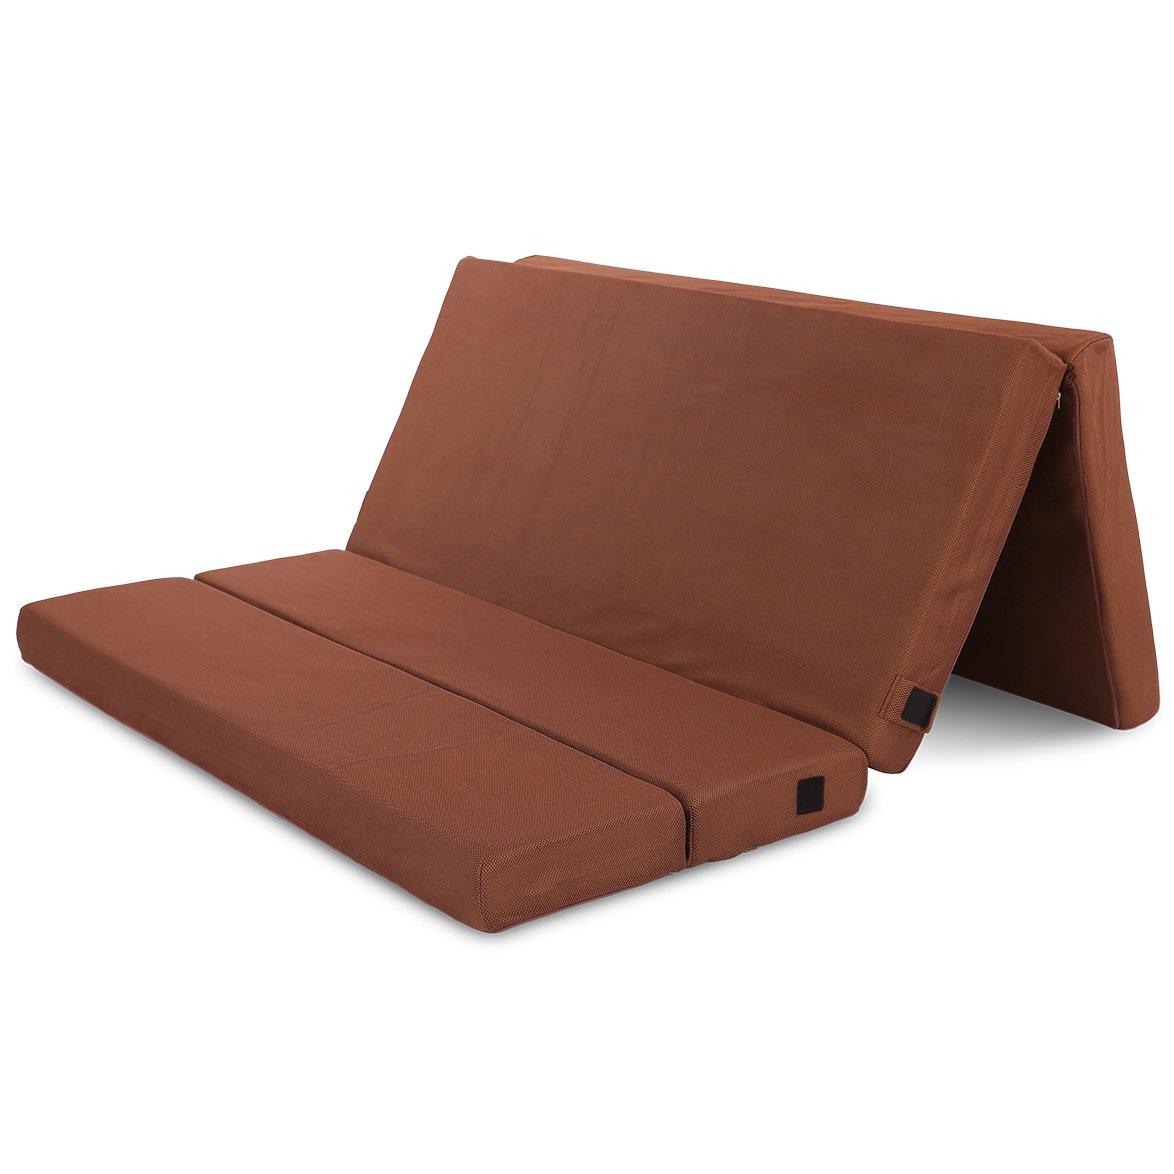 Cr Sleep 4-inch Folding Memory Foam Mattress Full Size, Ventilated Mesh Cover, 54 x 74 inches